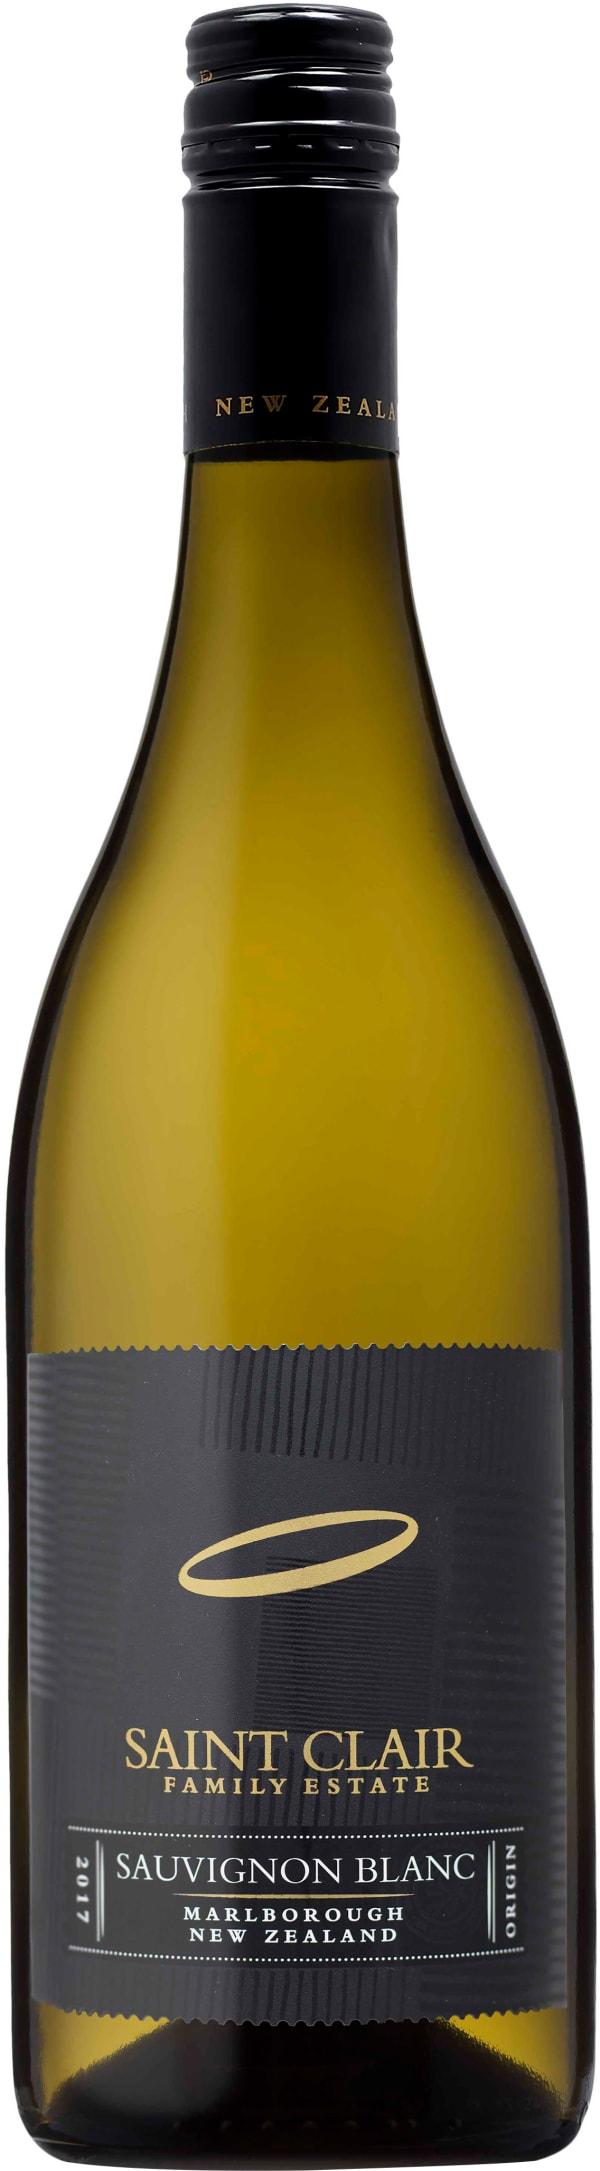 Saint Clair Marlborough Origin Sauvignon Blanc 2017